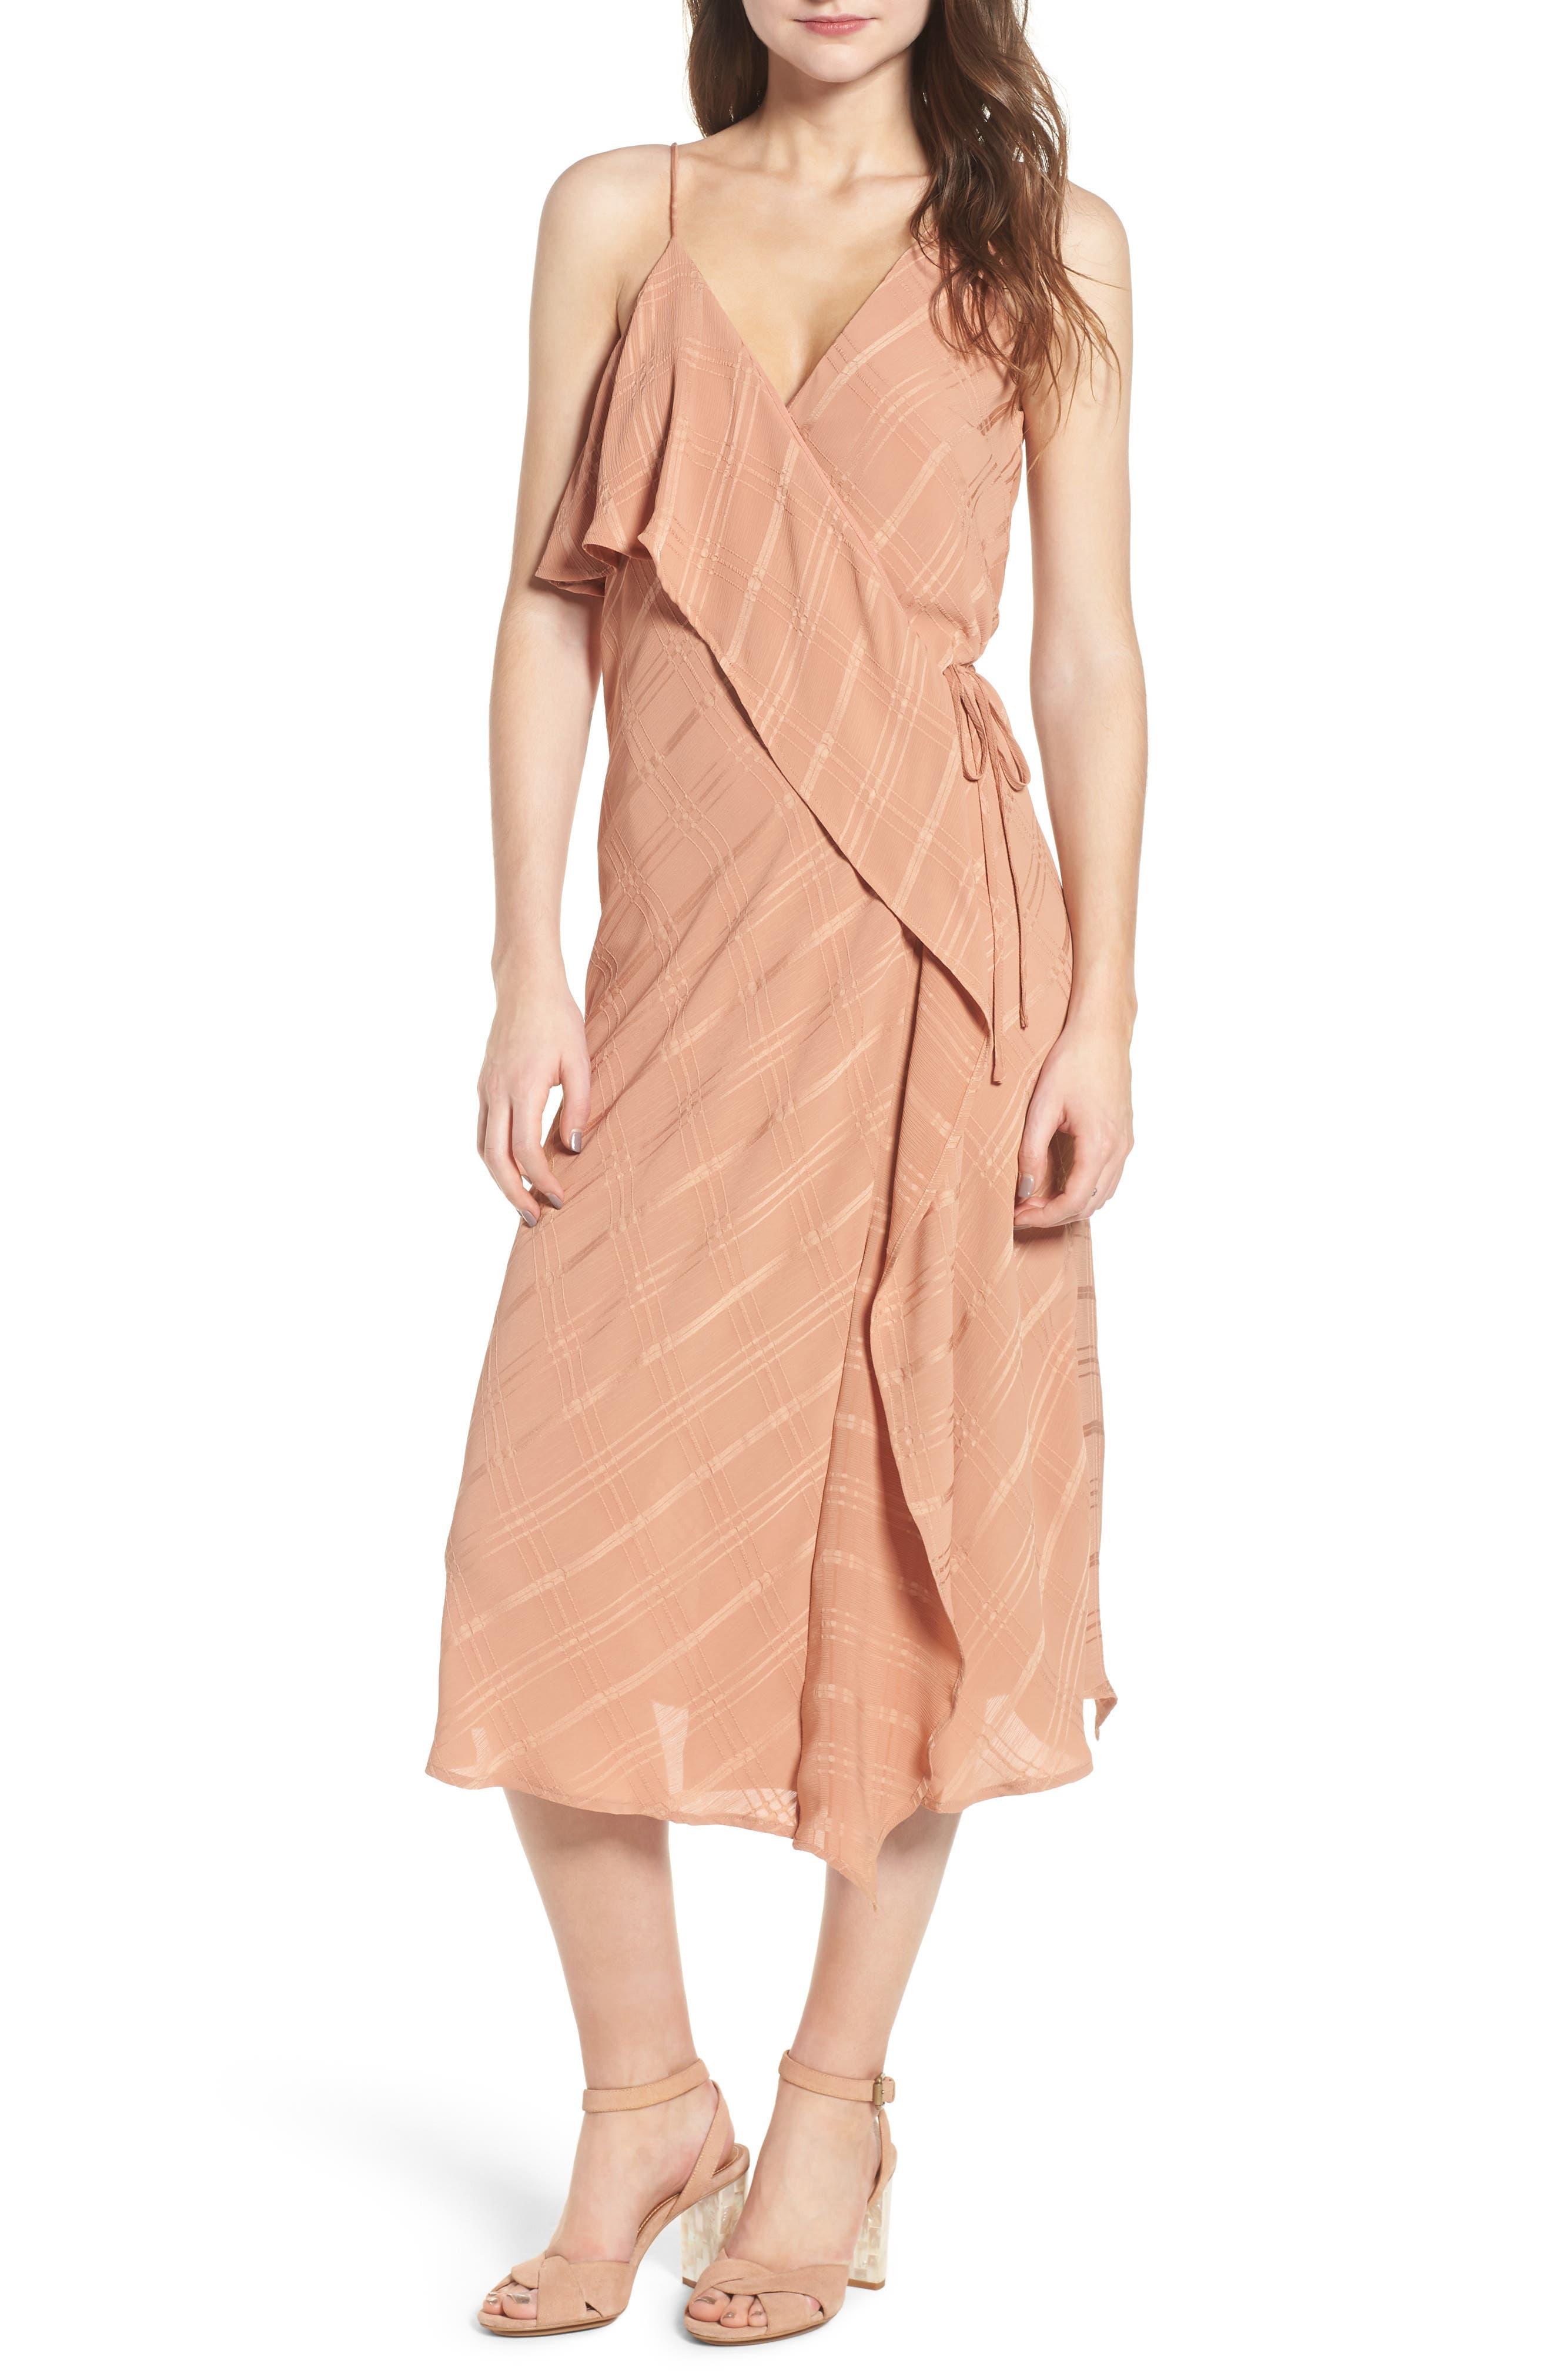 Yoanna Ruffle Trim Wrap Dress,                             Main thumbnail 1, color,                             250